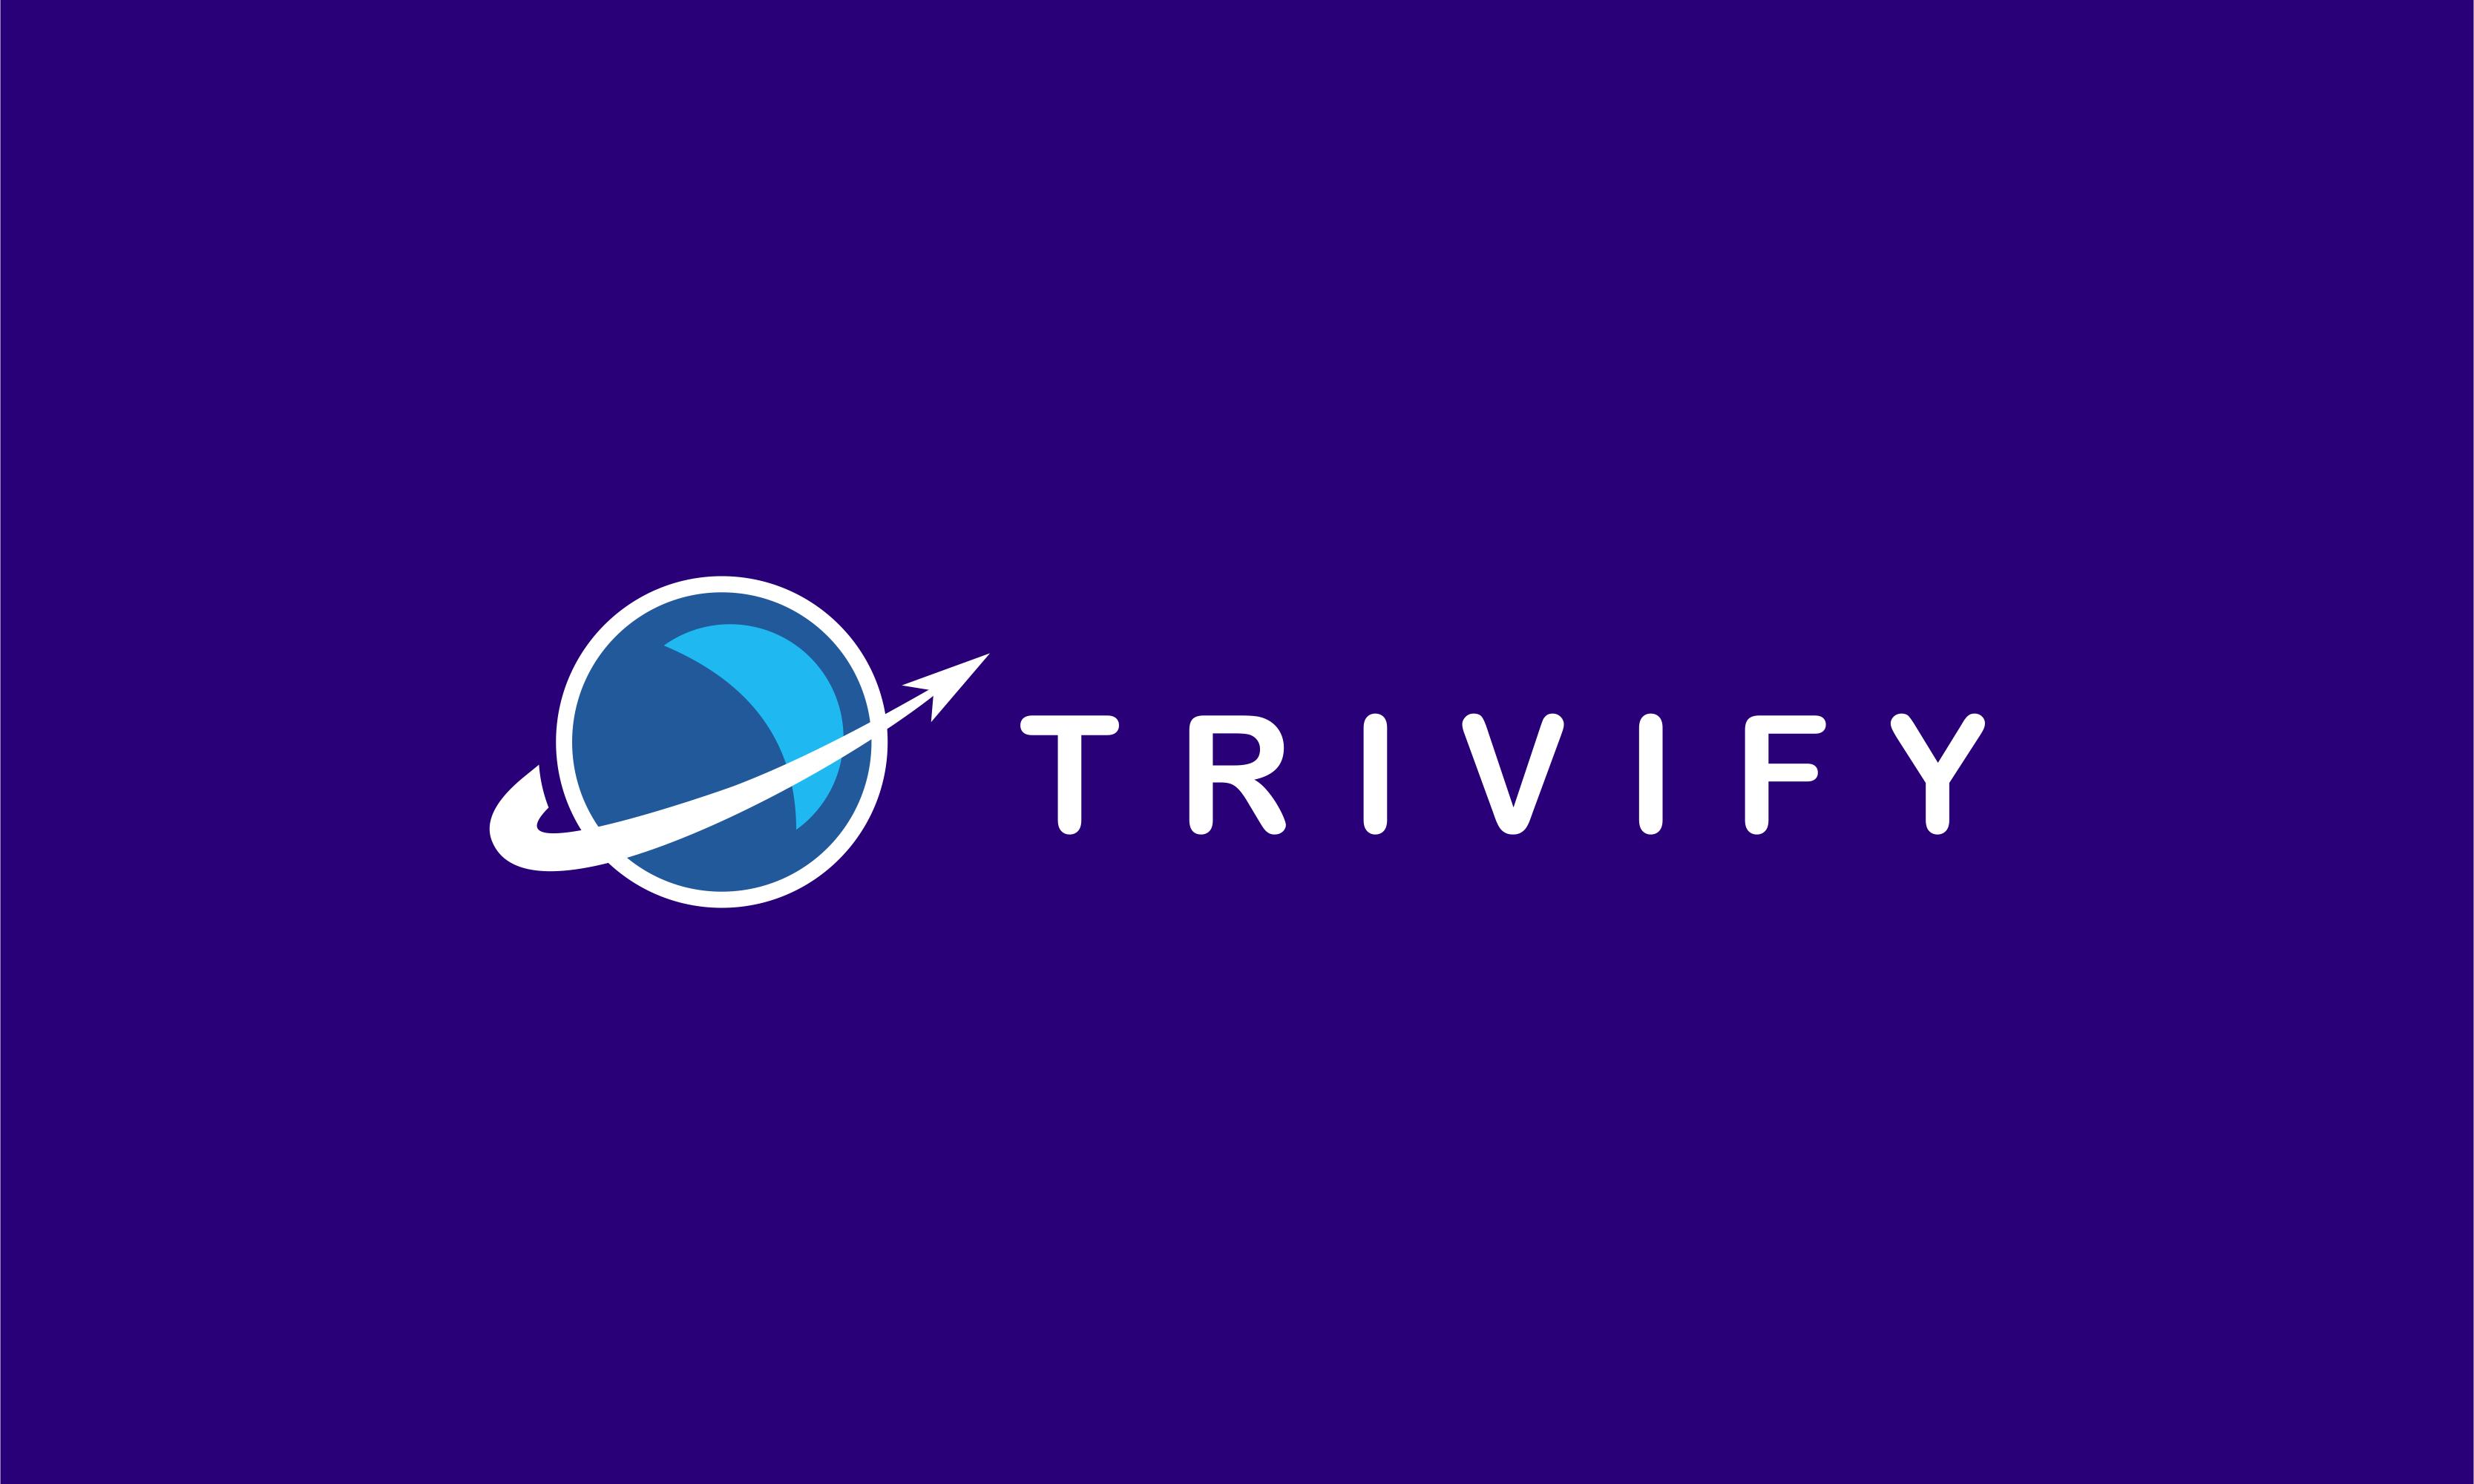 trivify